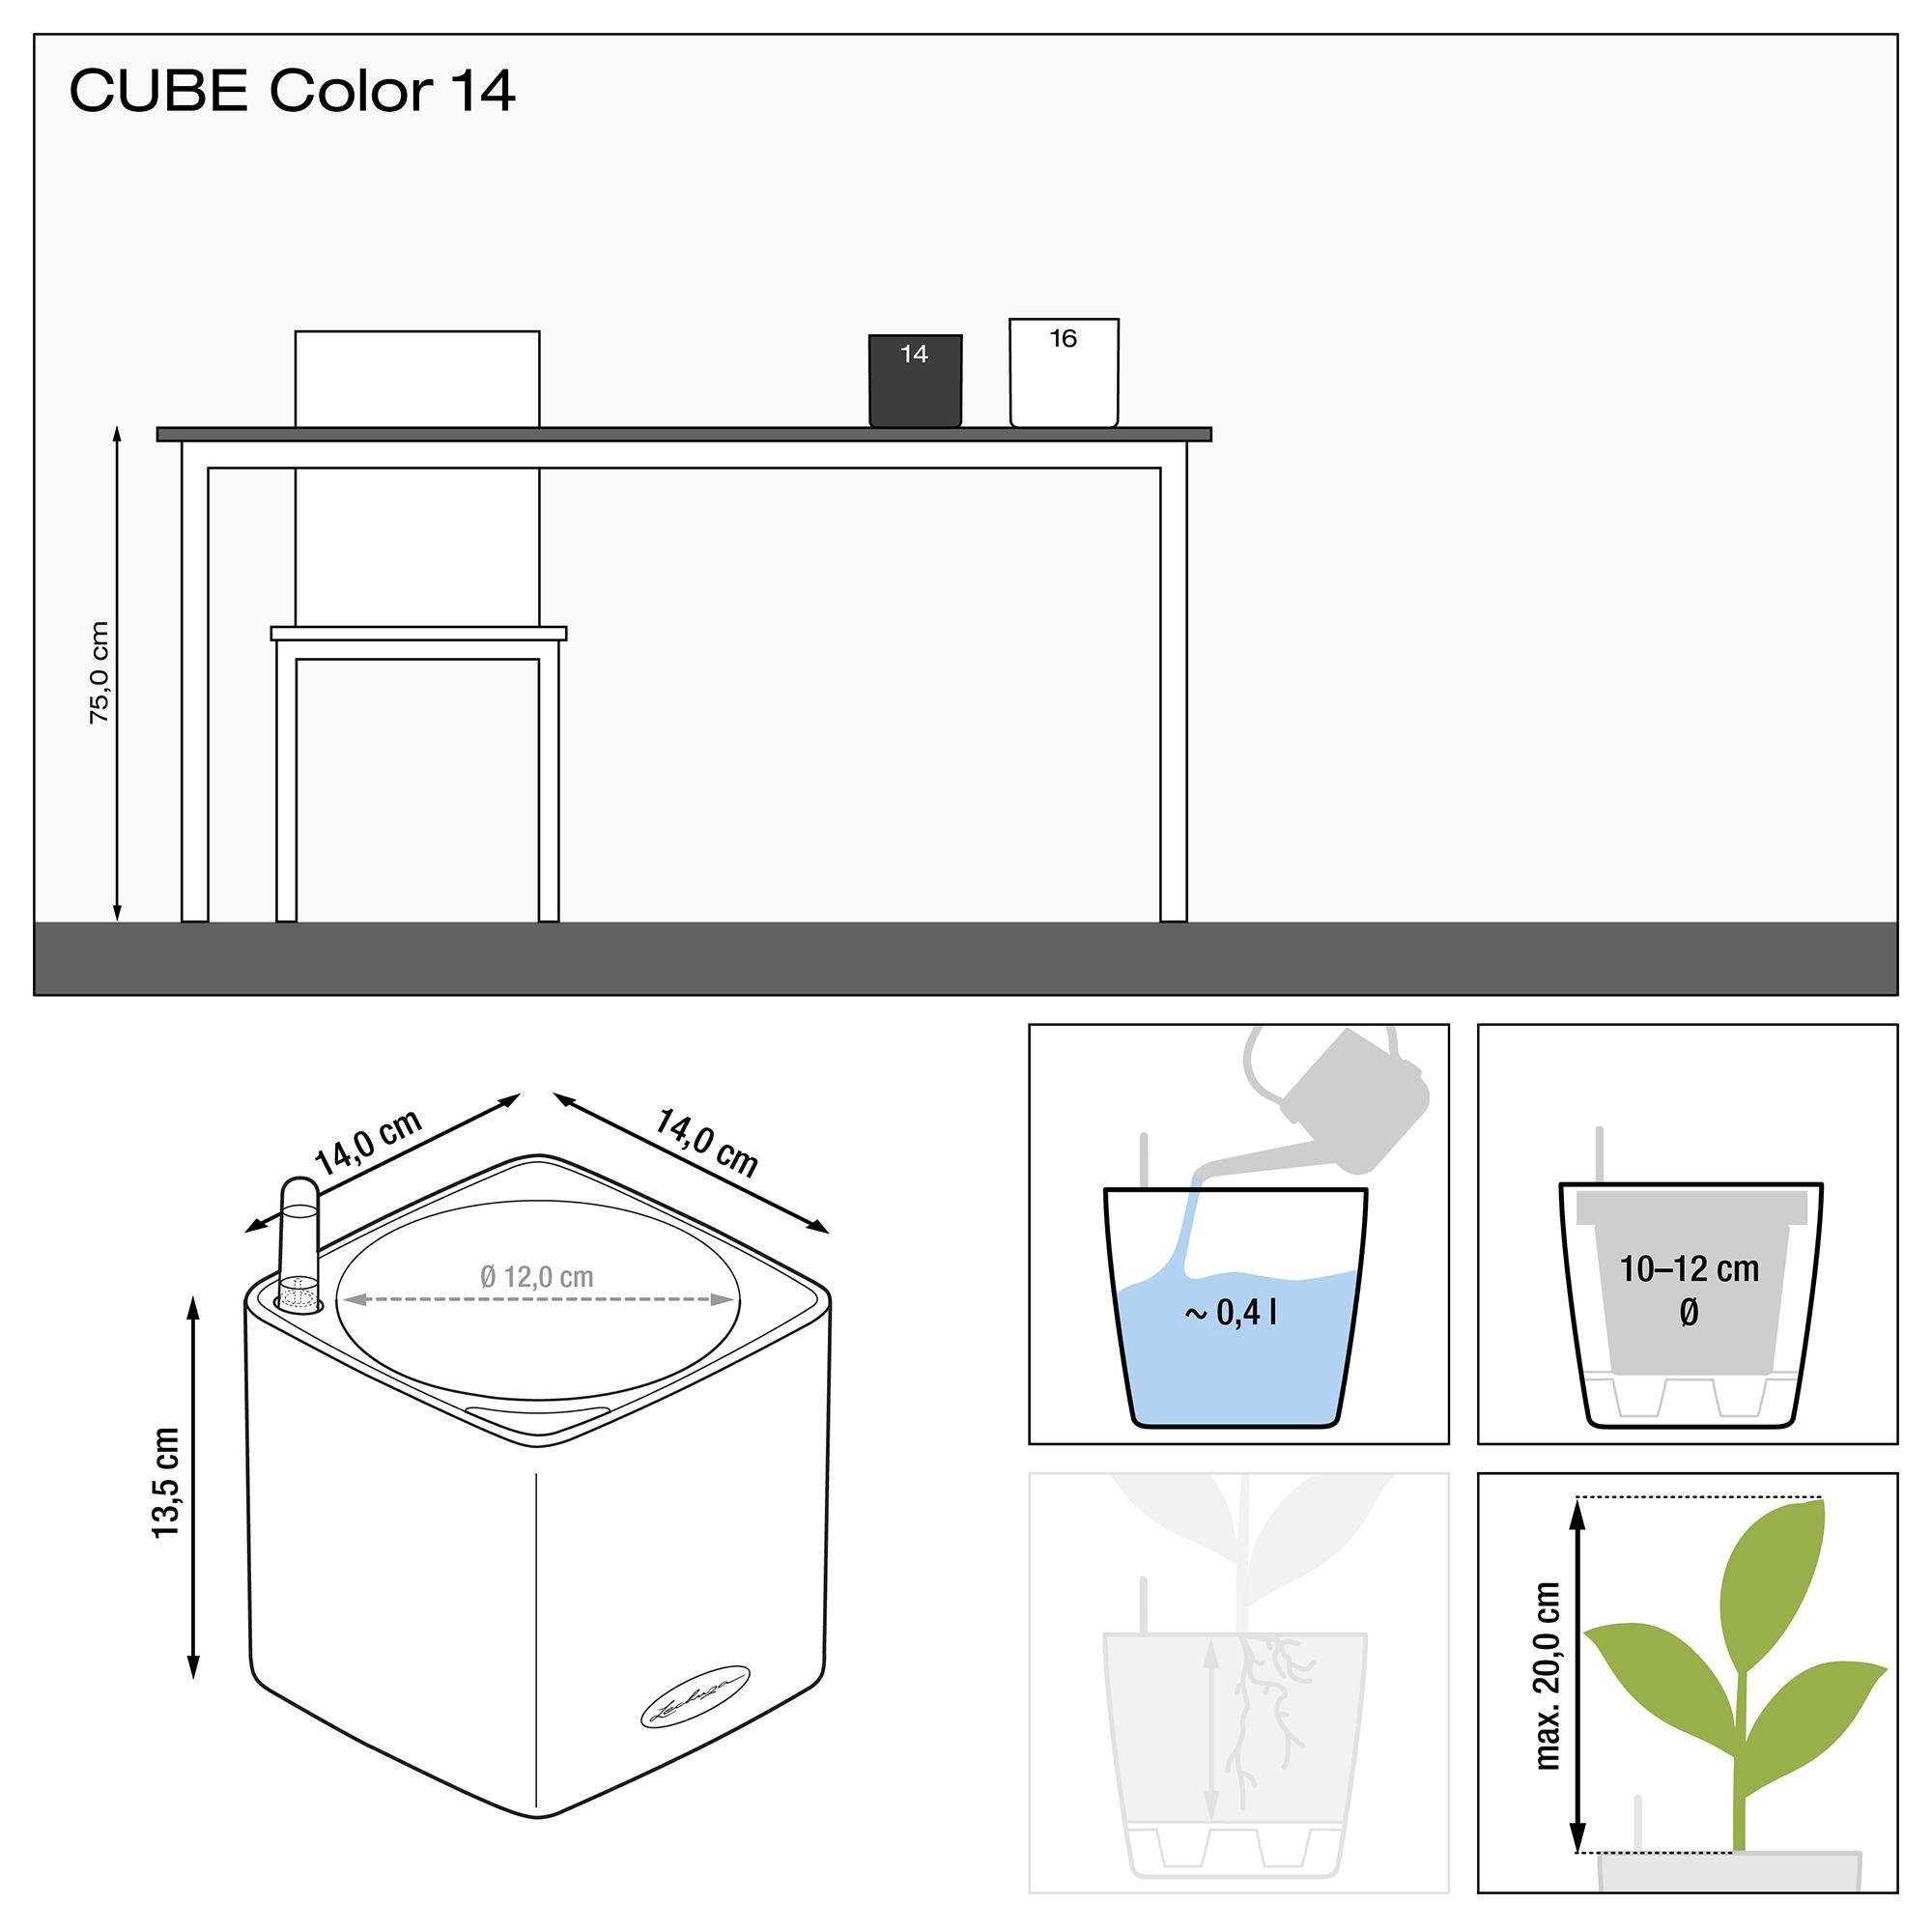 CUBE Color 14 weiß - Bild 2